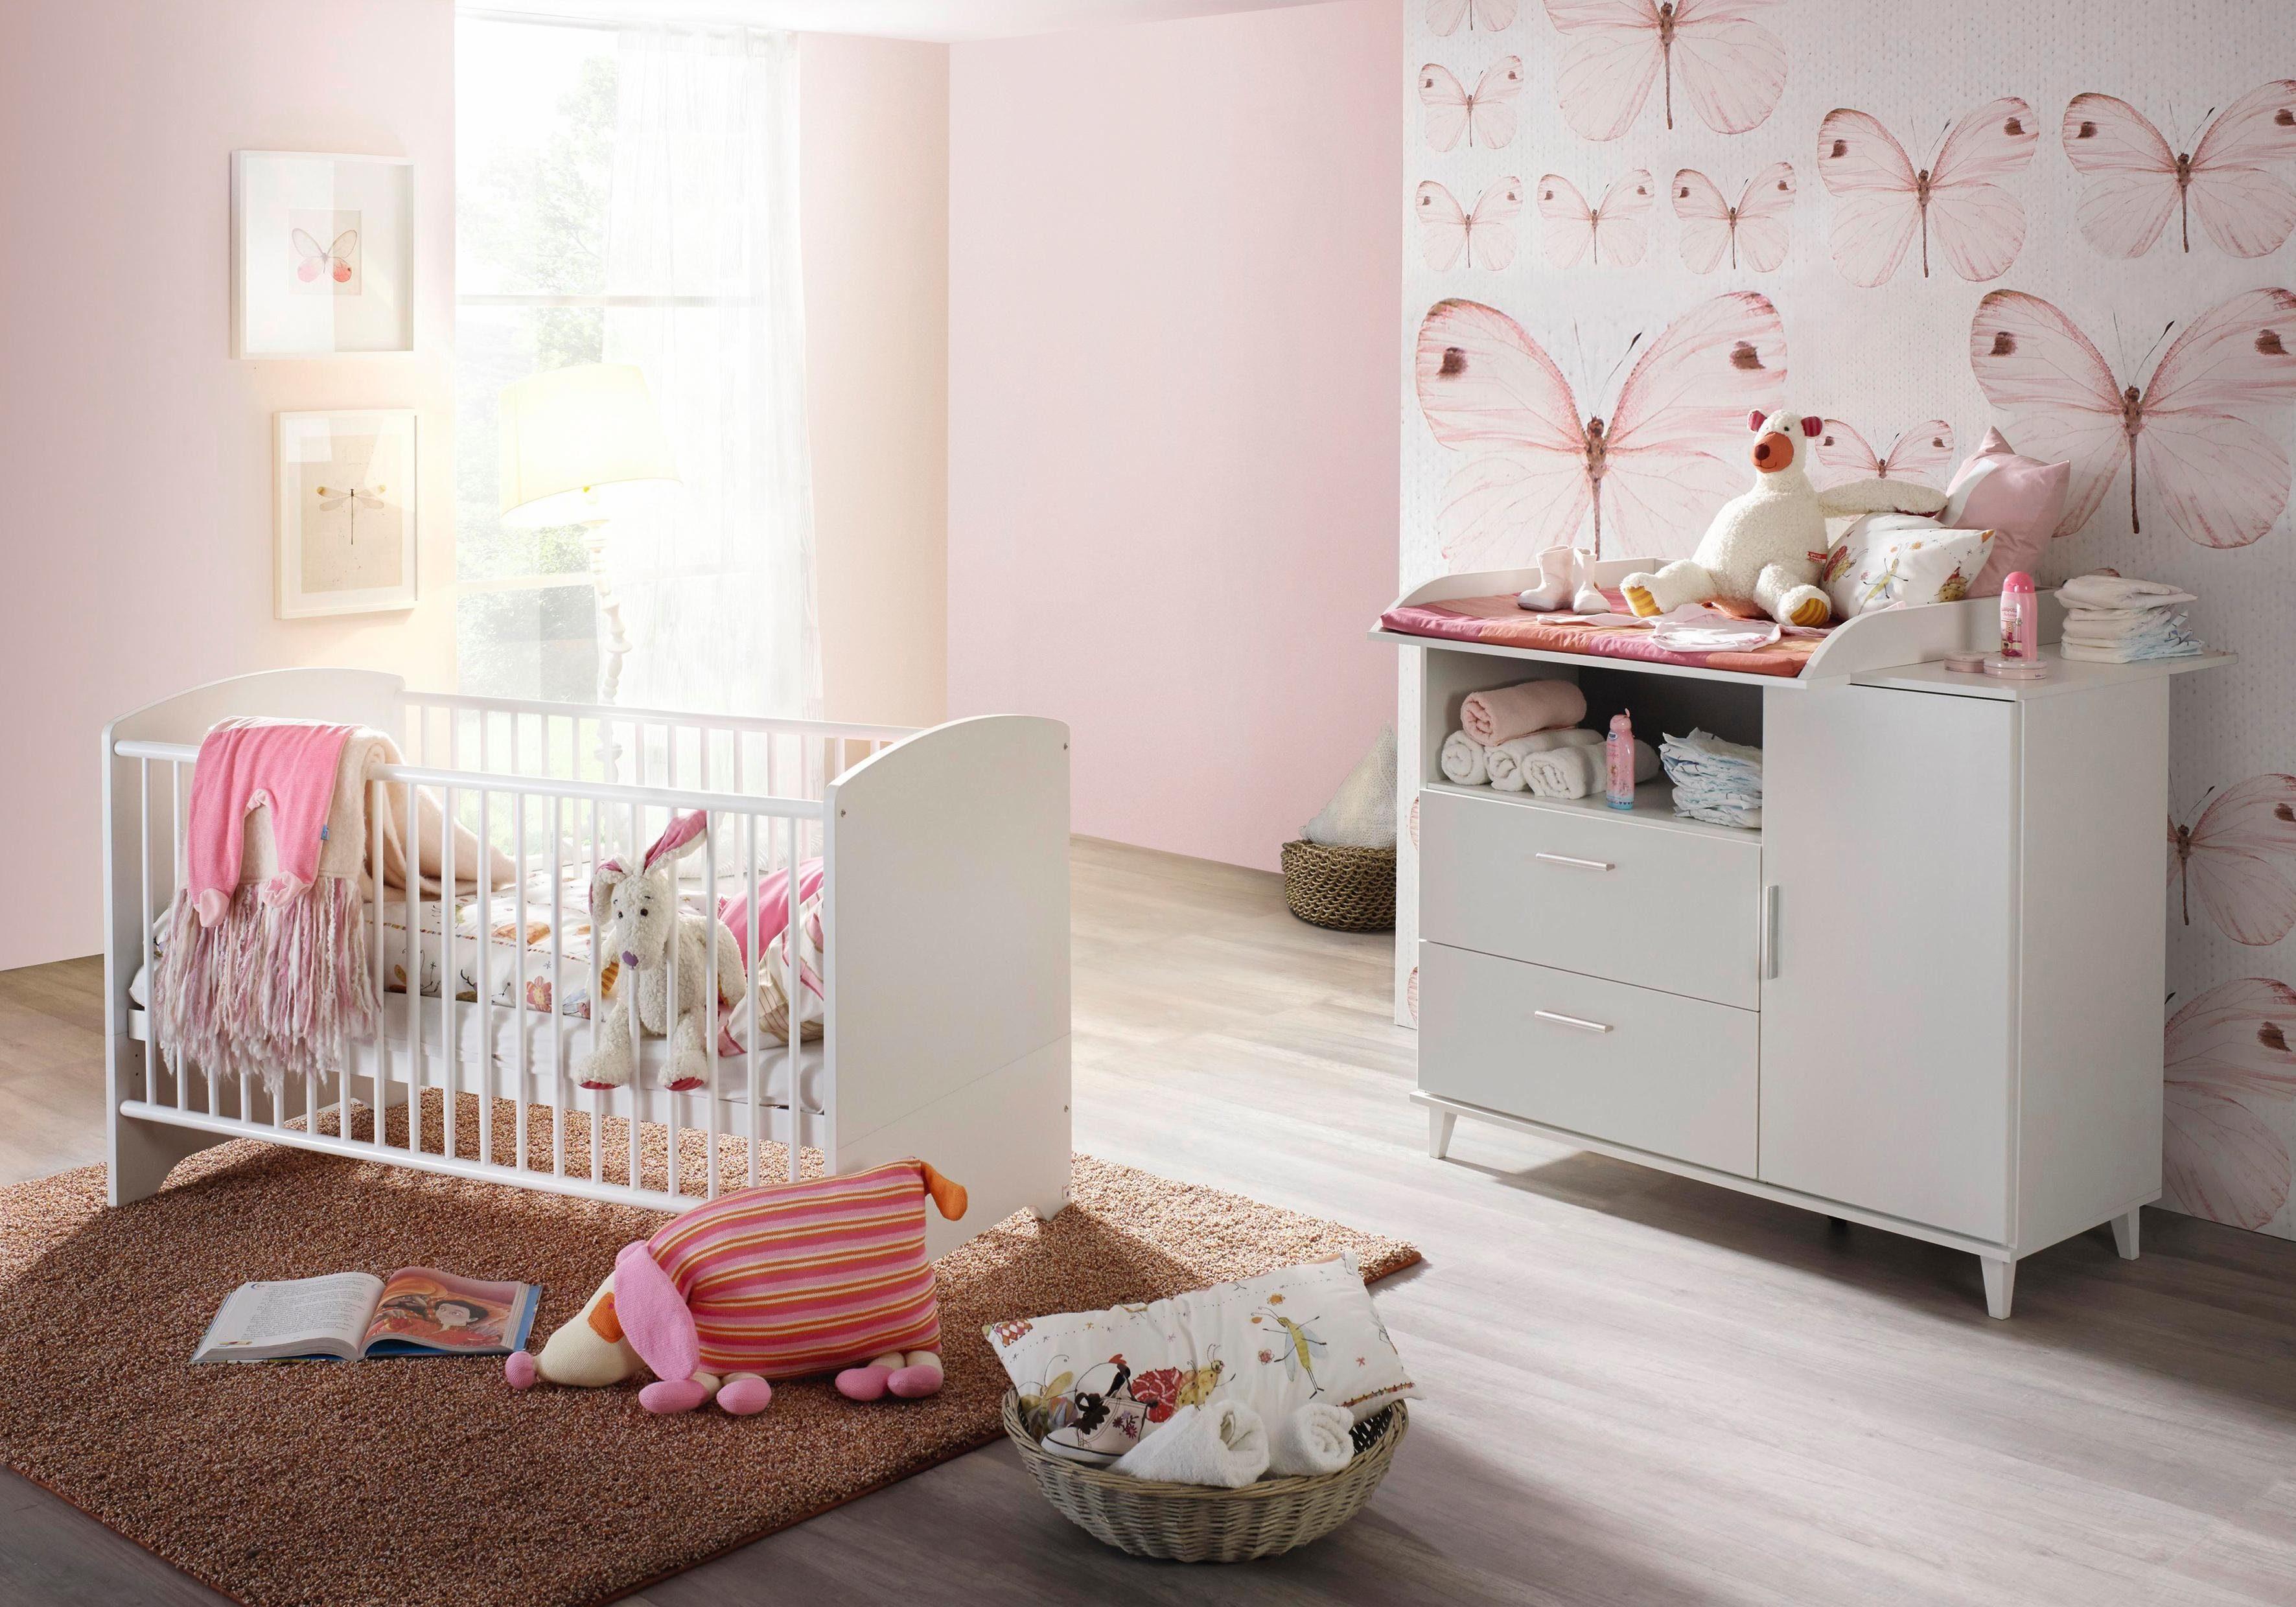 Babyzimmer Spar-Set »Nizza«, Babybett + Wickelkommode (2-tlg.) in alpinweiß